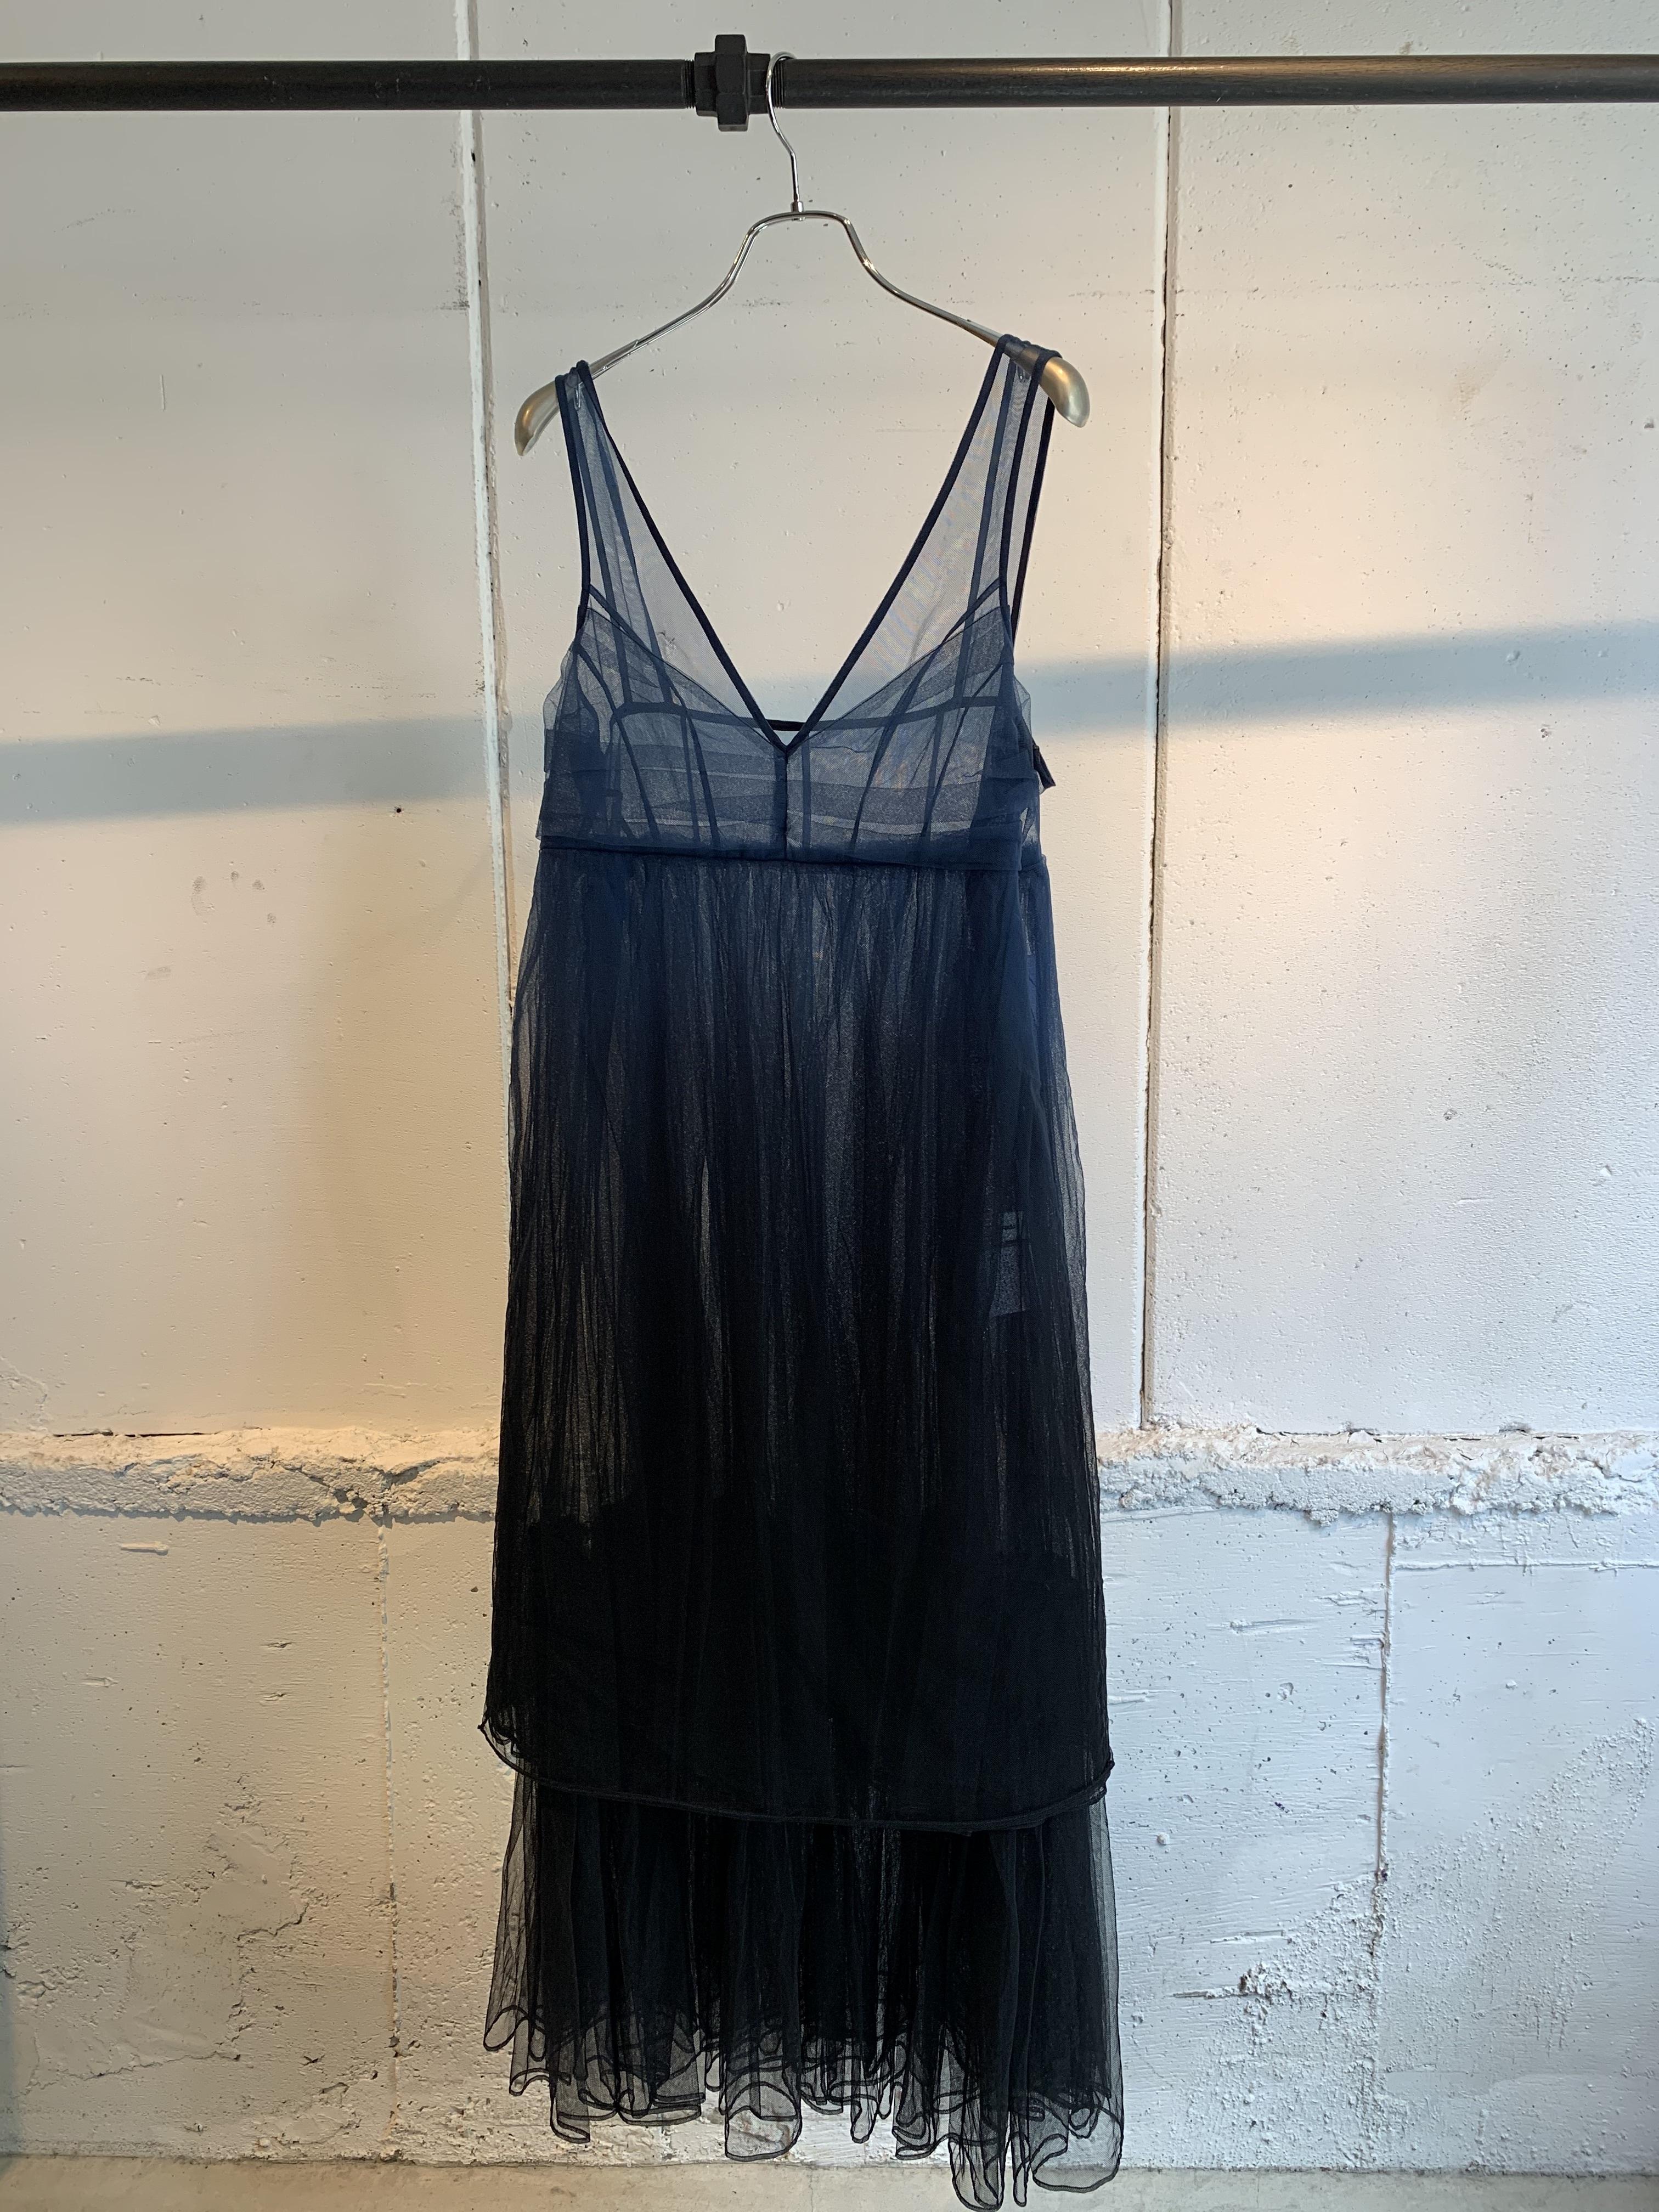 Chika kisada    tulle dress